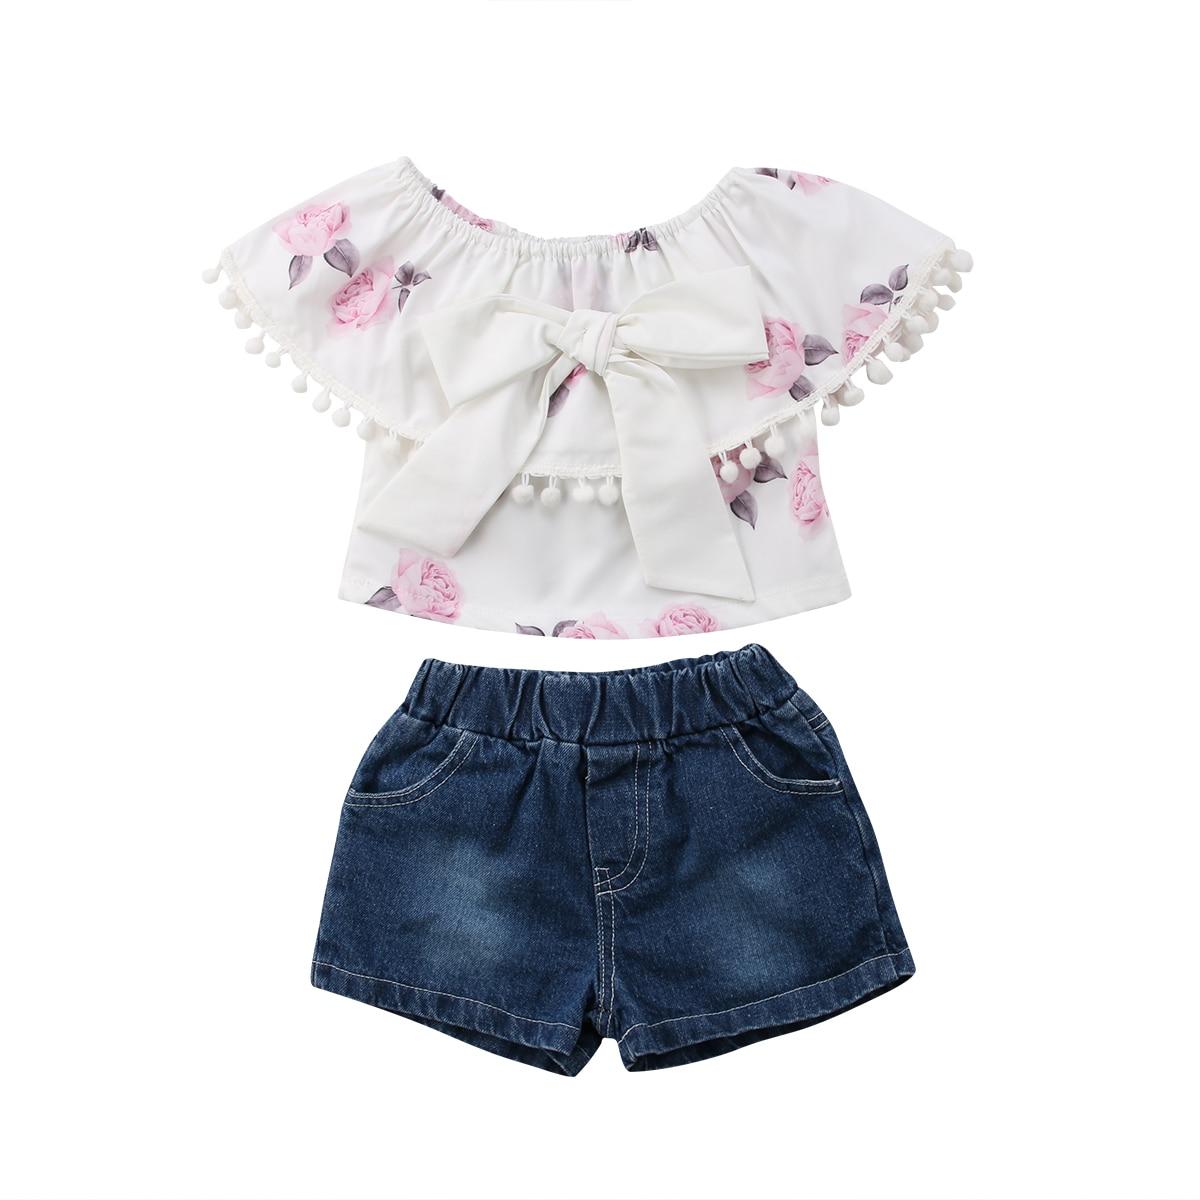 Denim Shorts Pants Jeans Outfits Clothes 2Pcs//Set Kids Baby Girl Off shoulder Flower T-shirt Tops